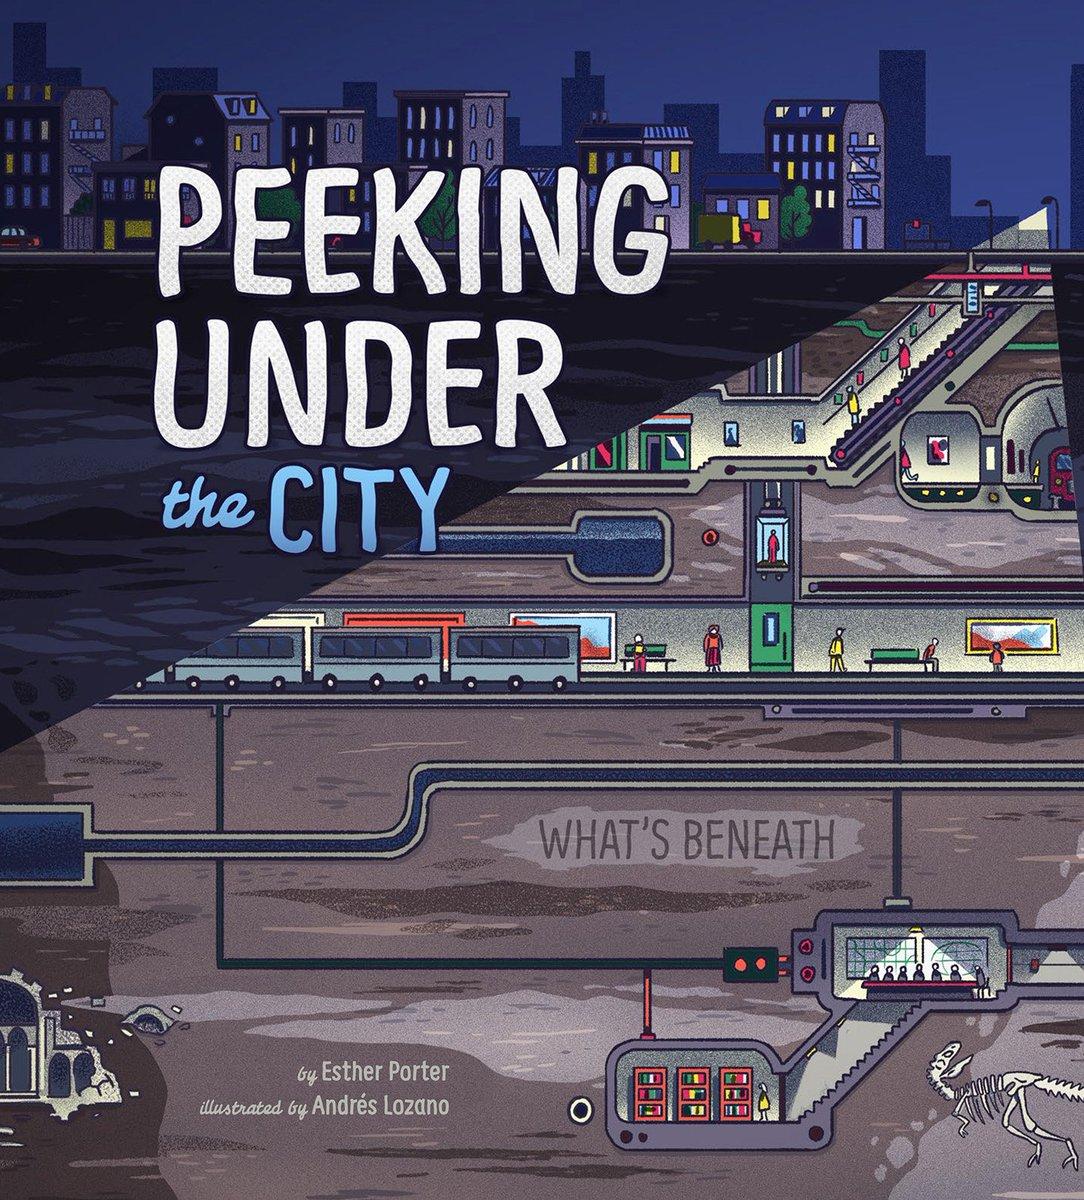 PEEKING UNDER THE CITY, Esther Porter